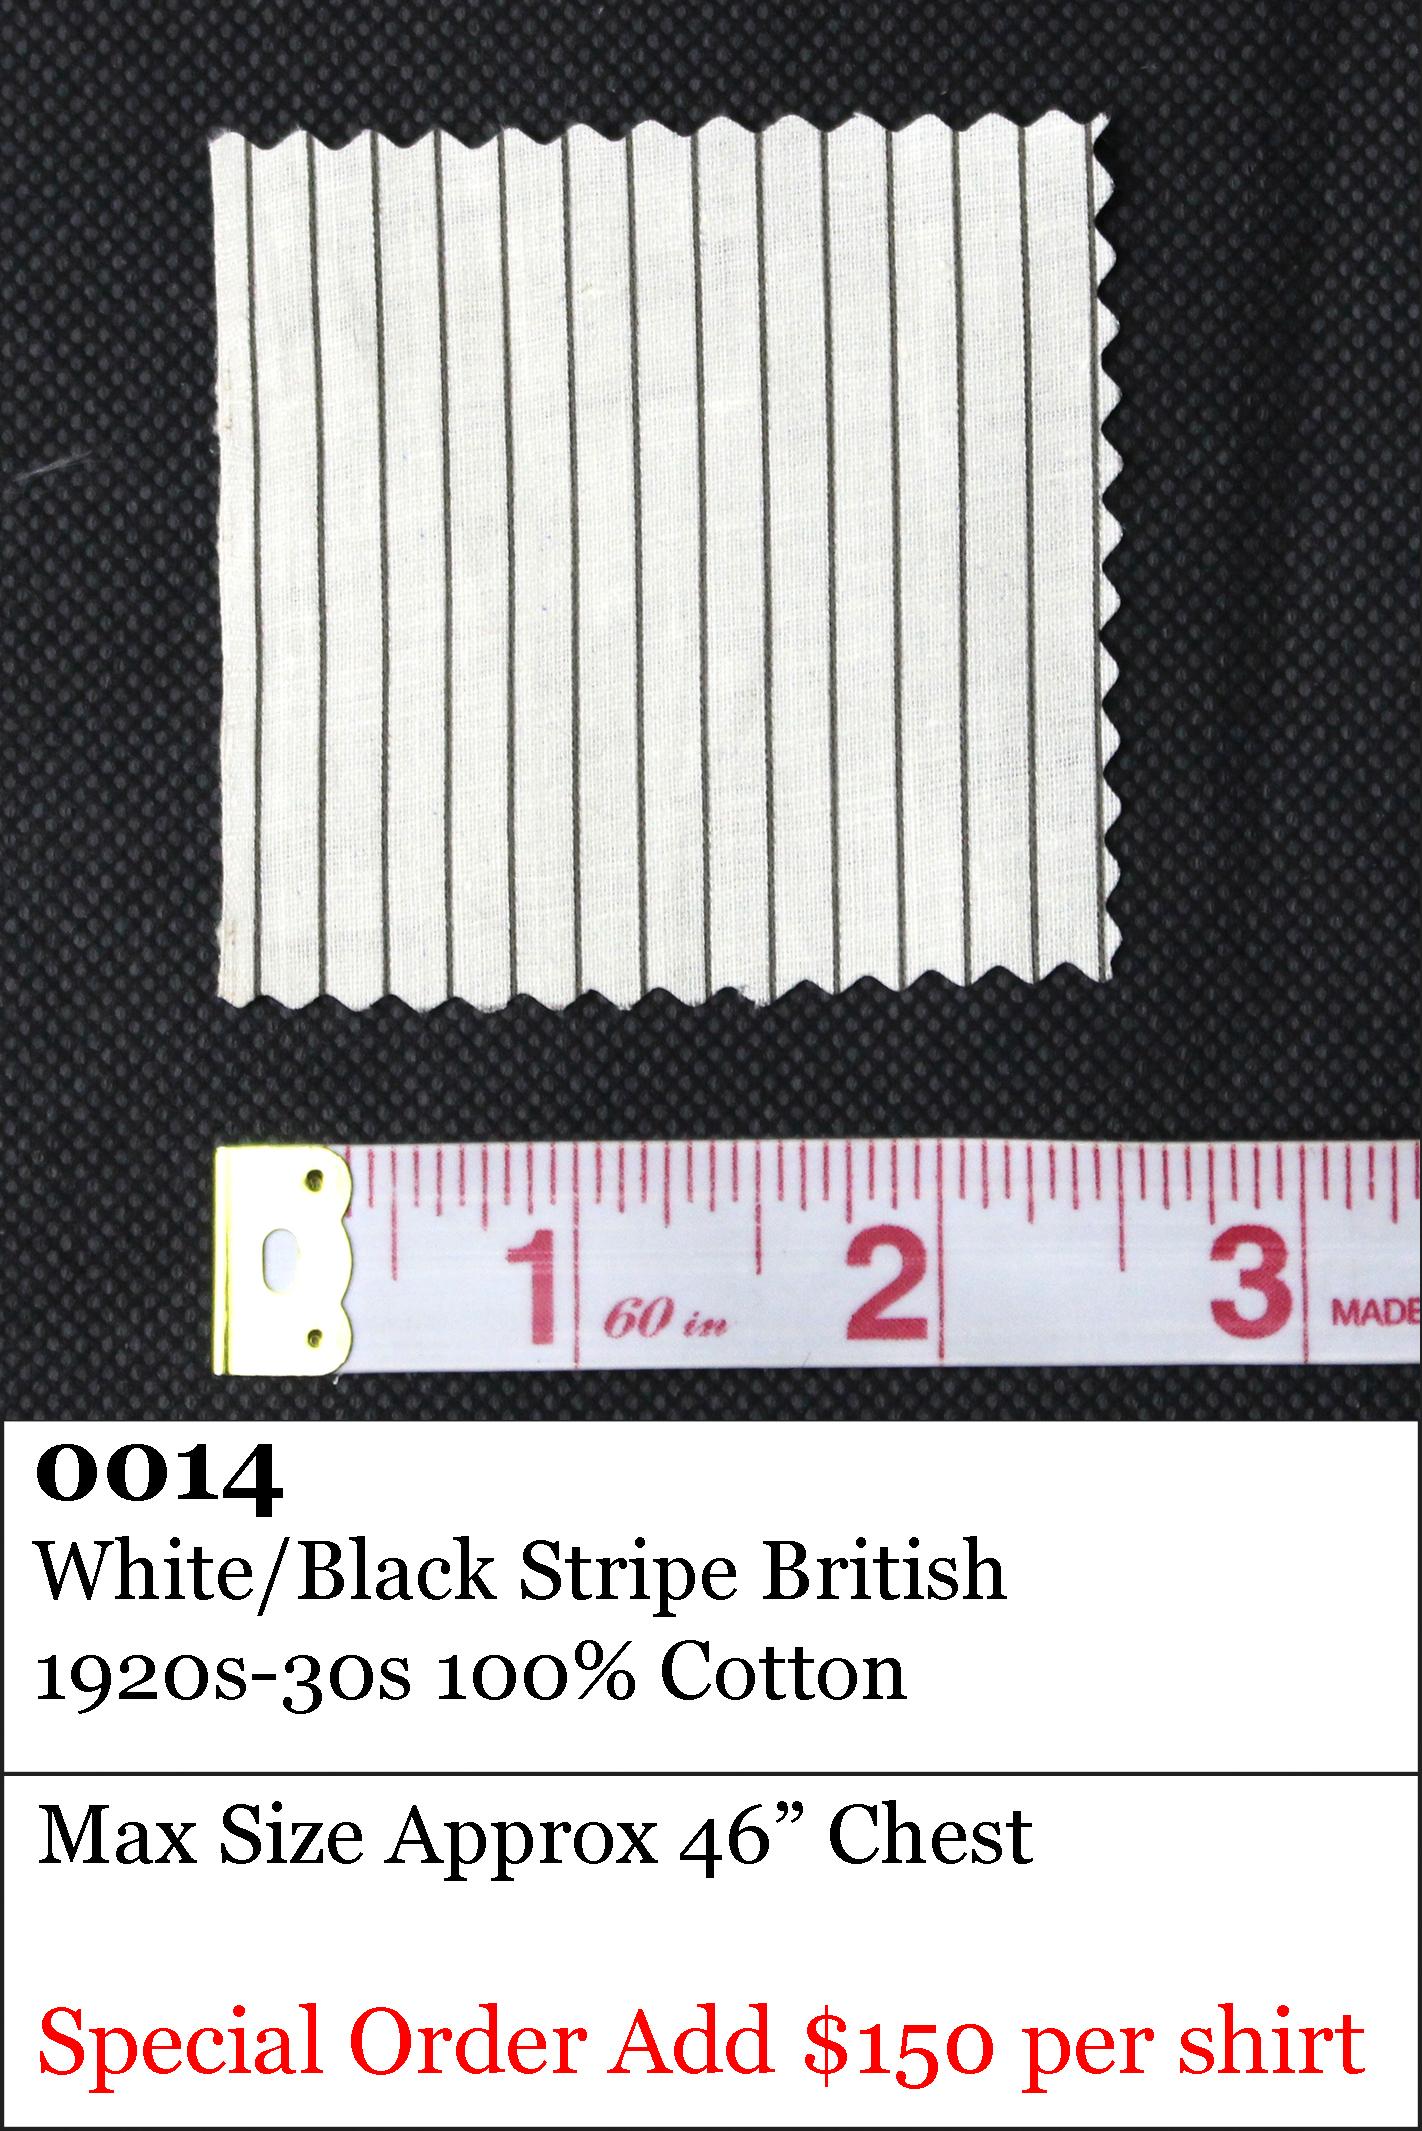 Fabric0014.jpg